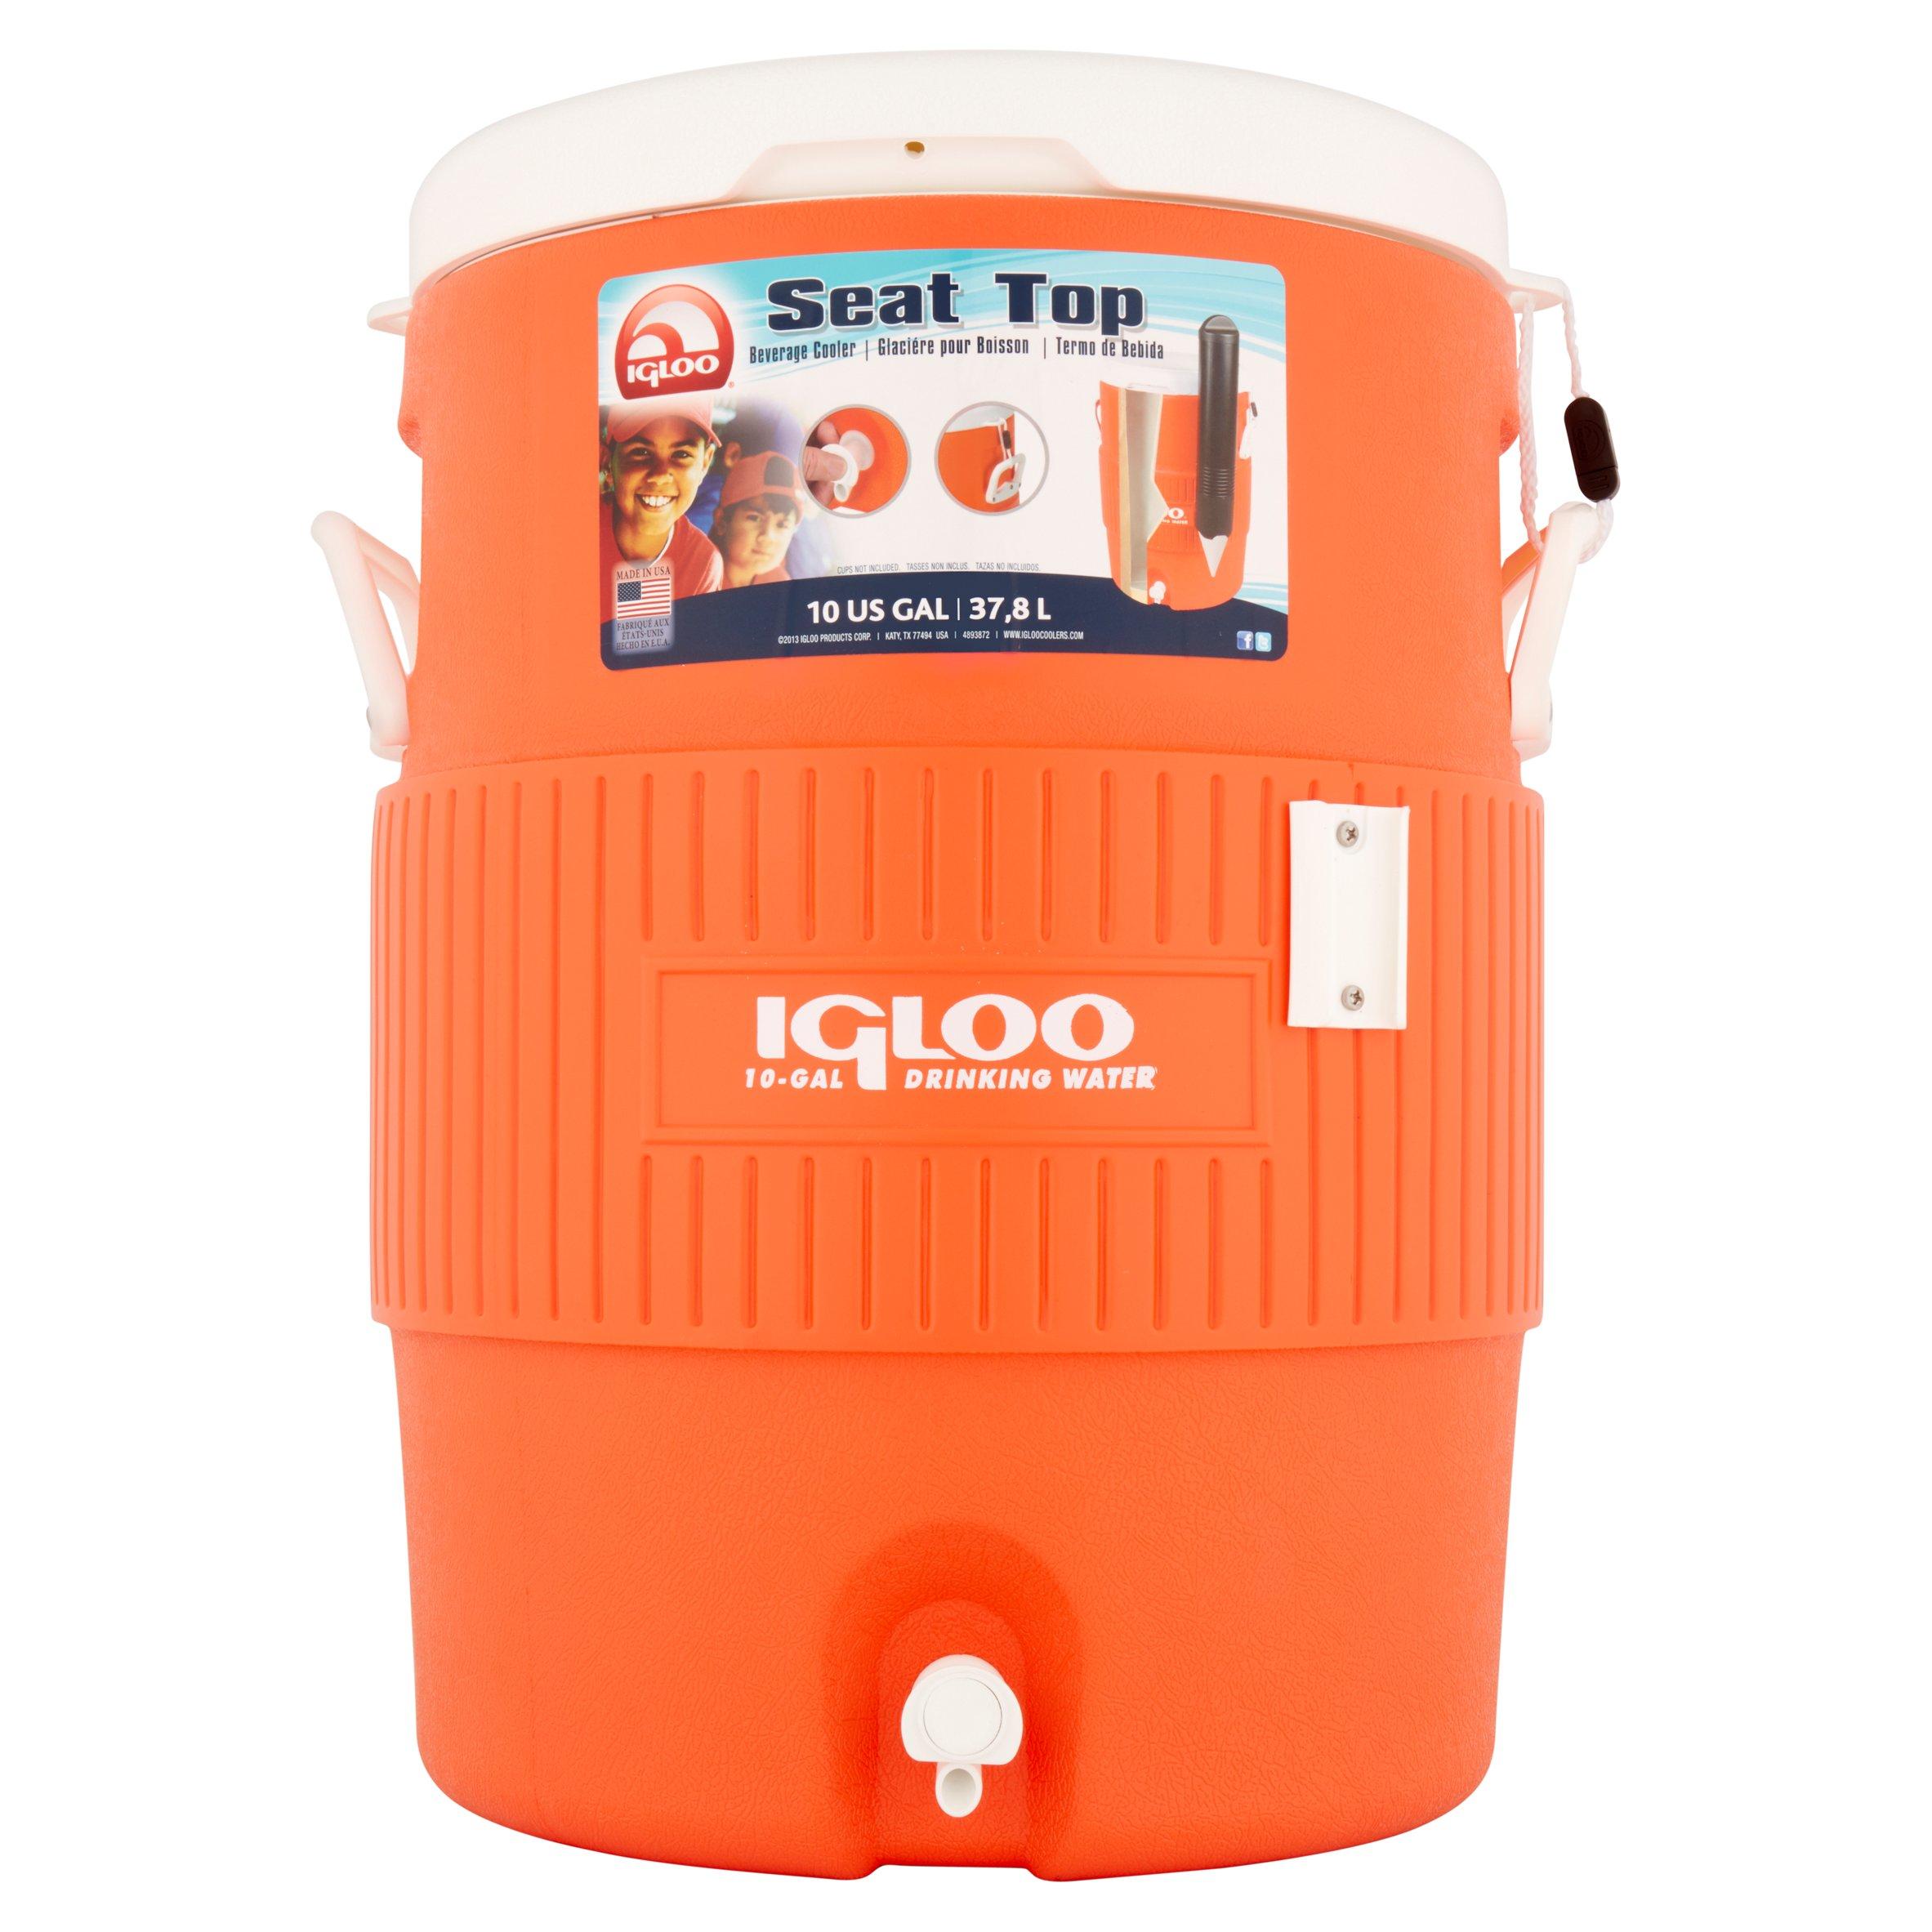 Igloo Seat Top 10 US Gal Beverage Cooler